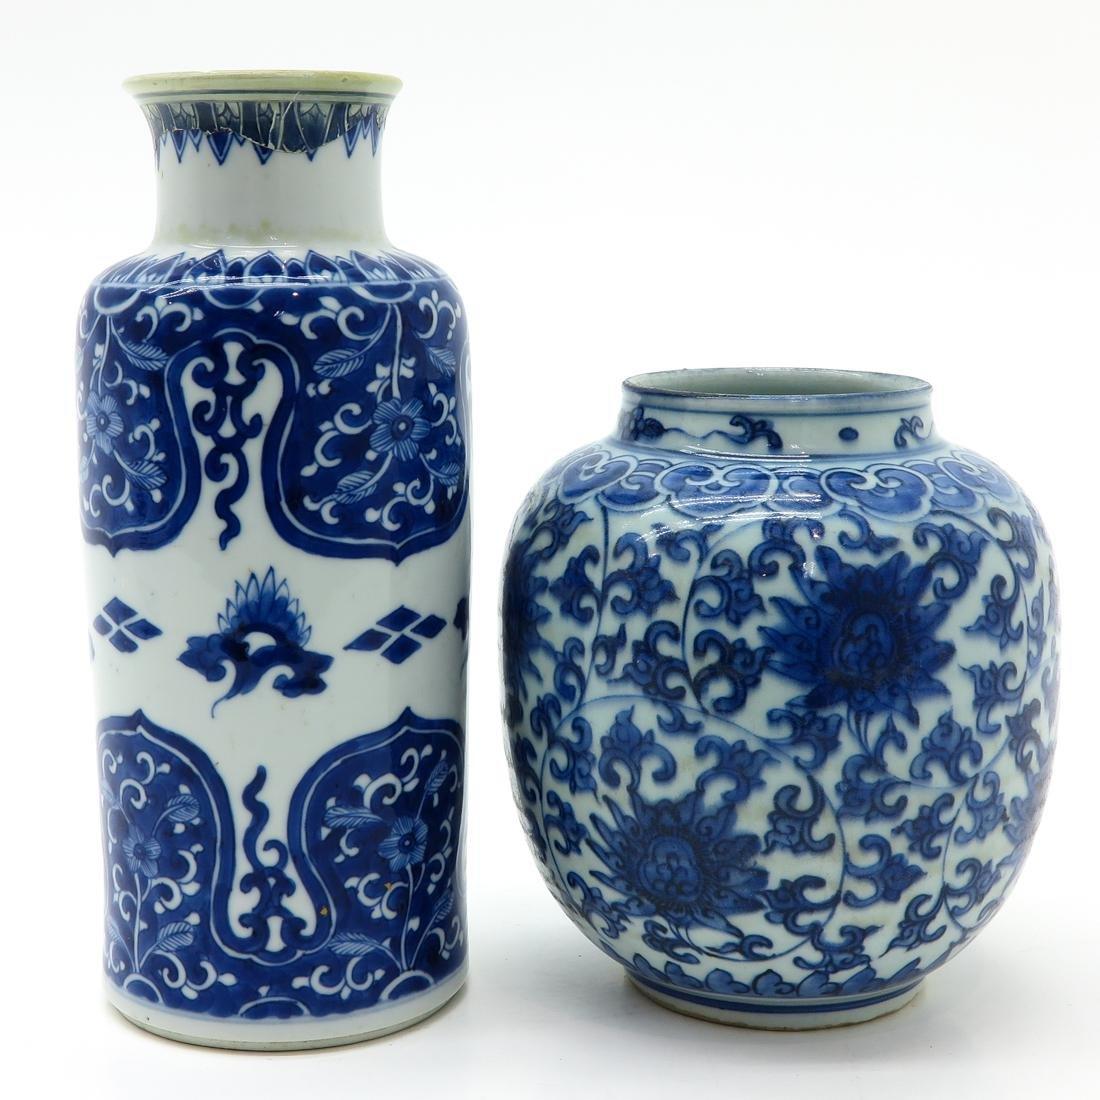 Lot of 2 Vases